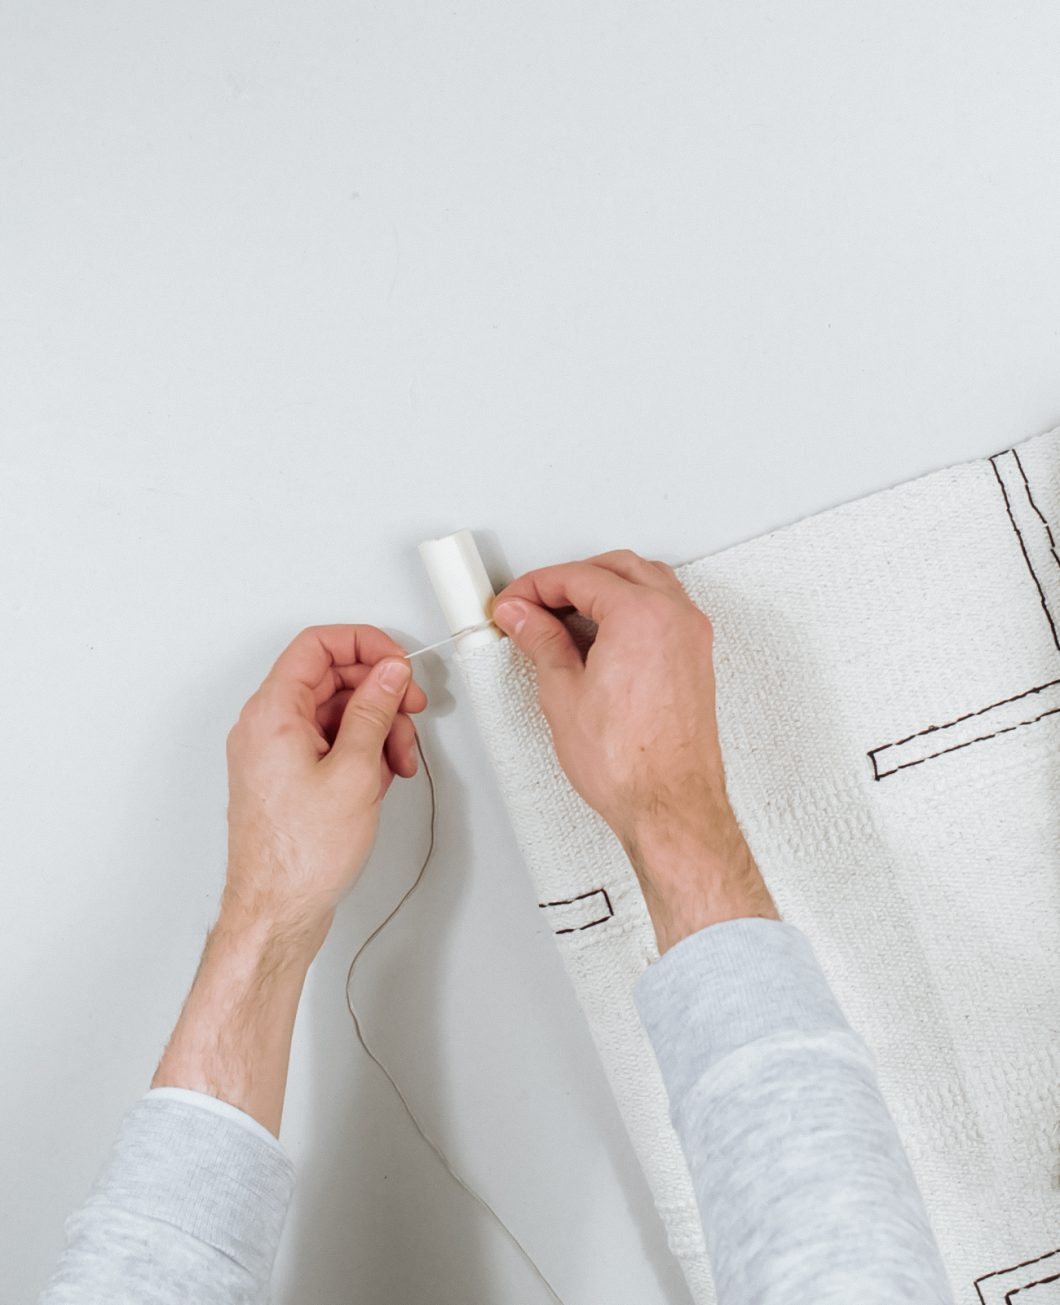 tapis deco murale boheme broderie Ikea Hack tuto dia etape 7